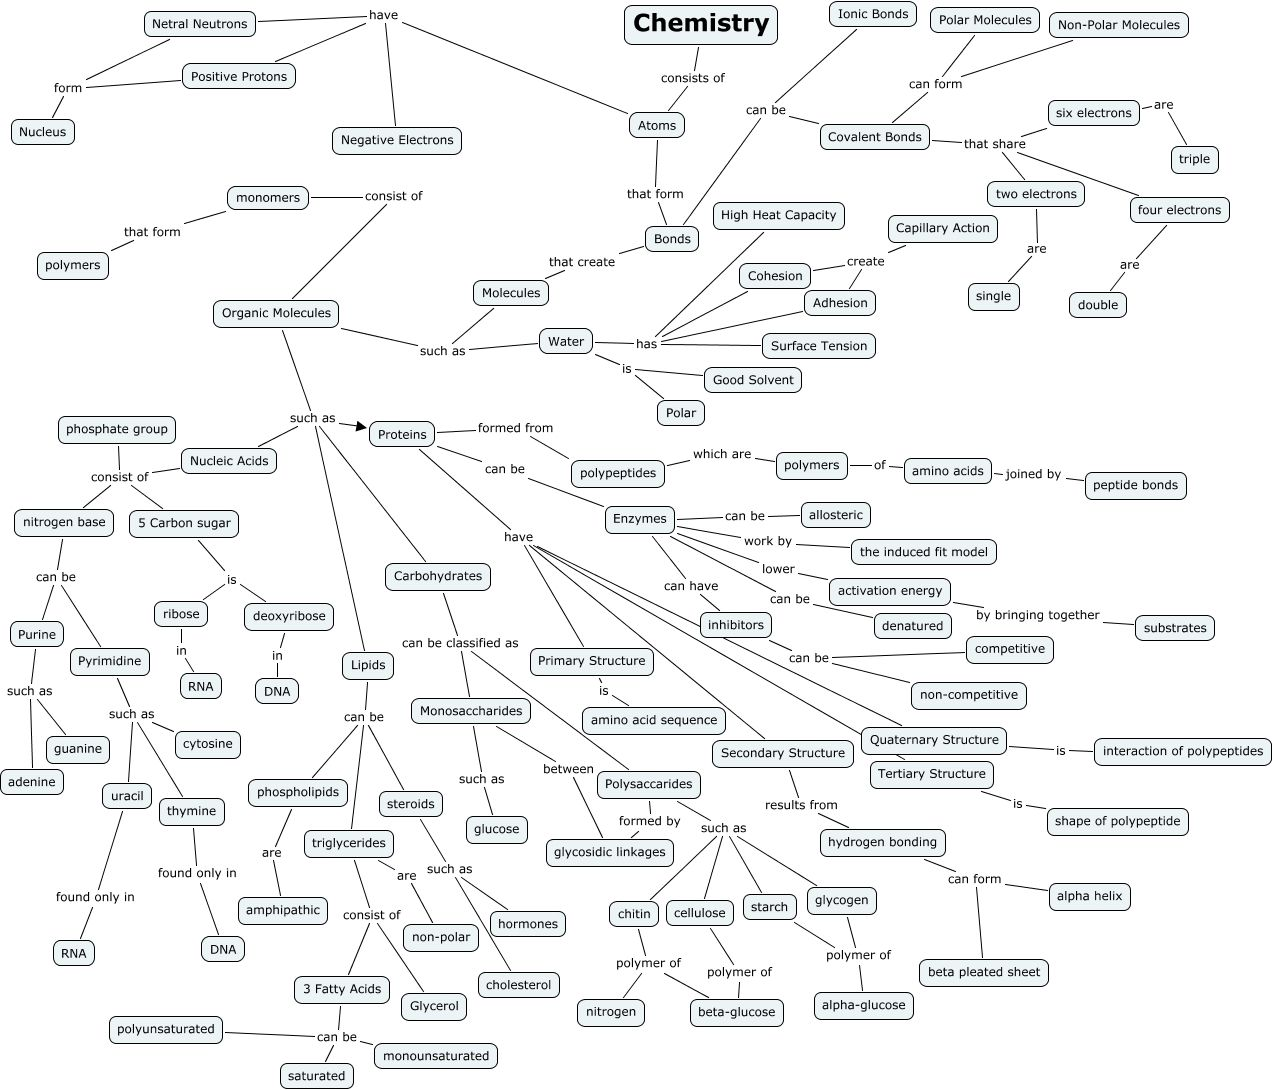 Organic Chemistry Concept Map.Organic Chemistry Concept Map Warning Organic Chem Pinterest